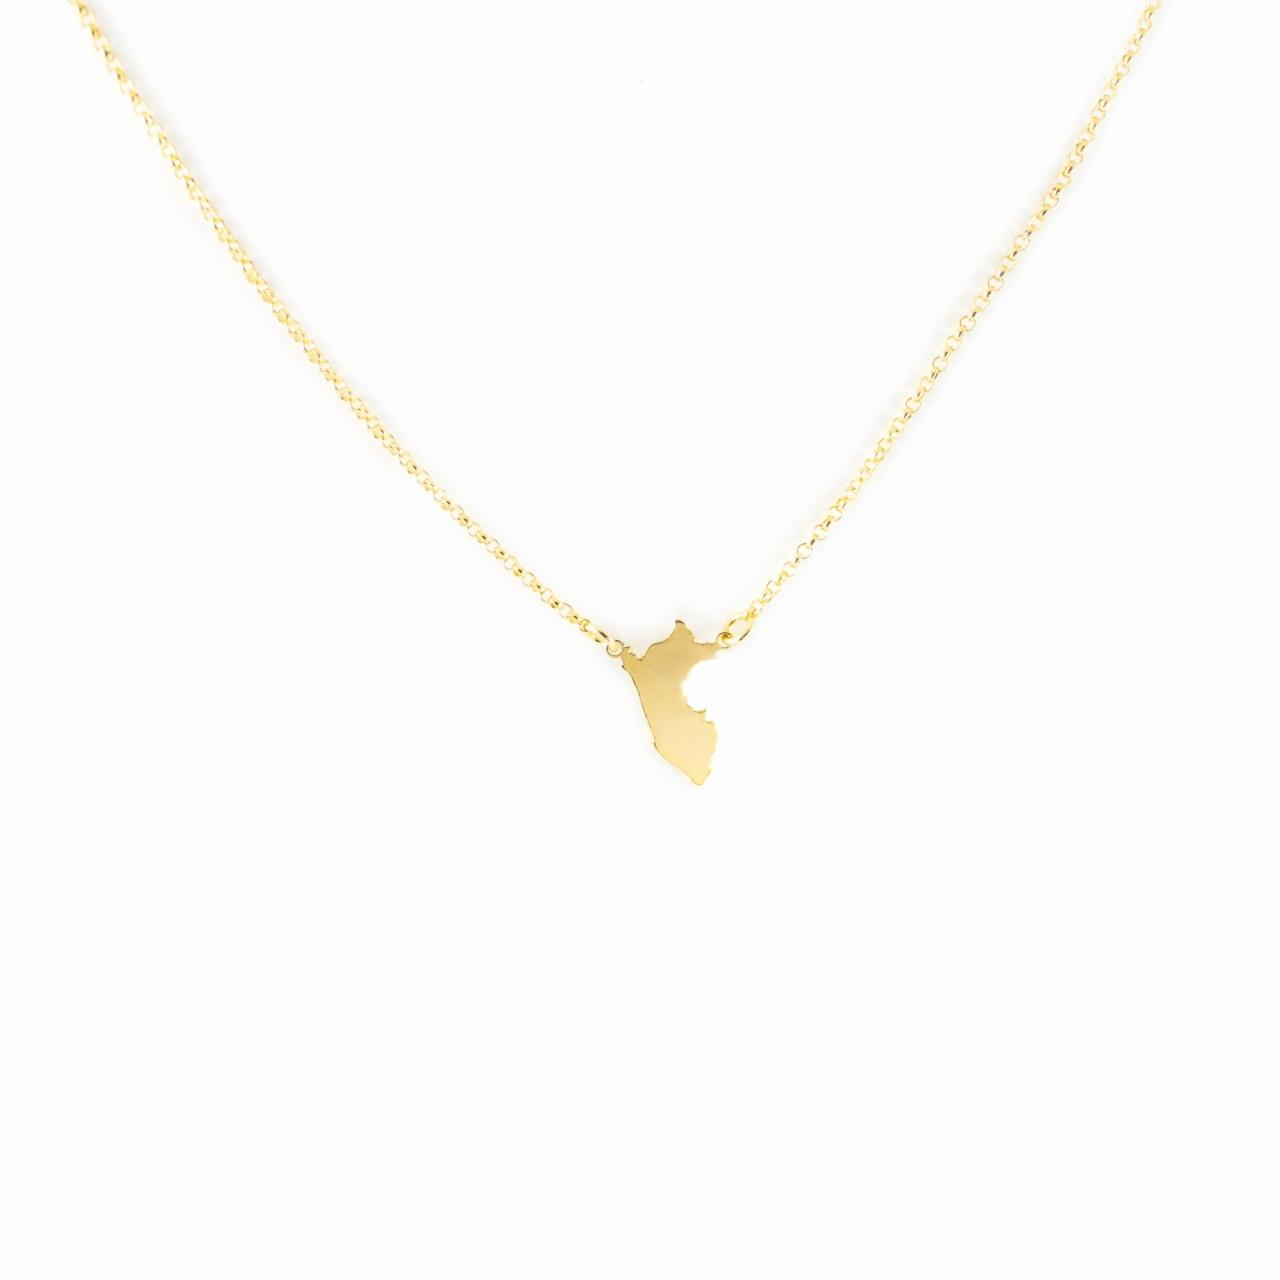 a13905720341 Collar Perú de plata enchapada en oro